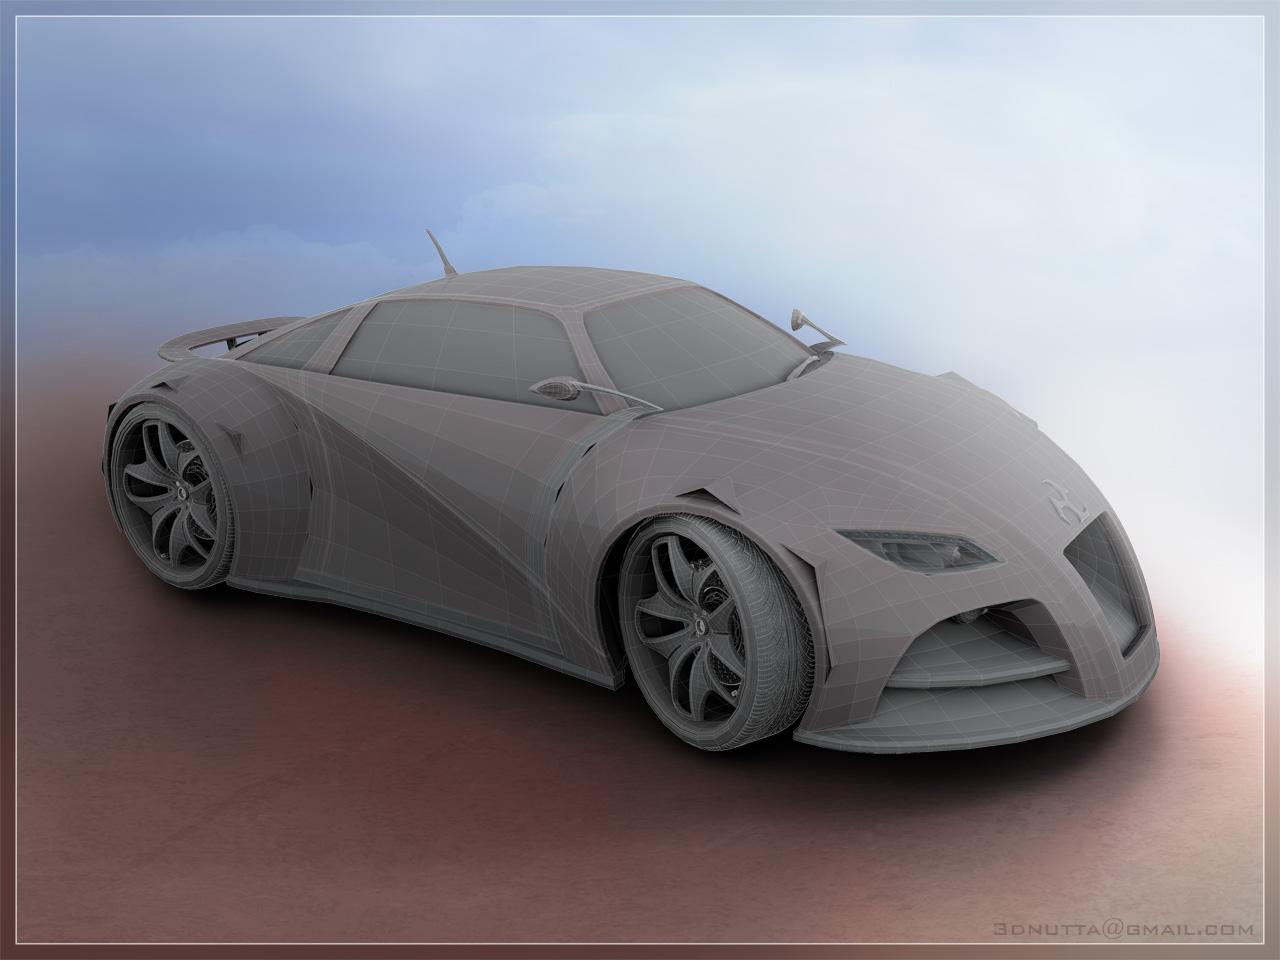 Concept Car - Vector by 3DnuTTa